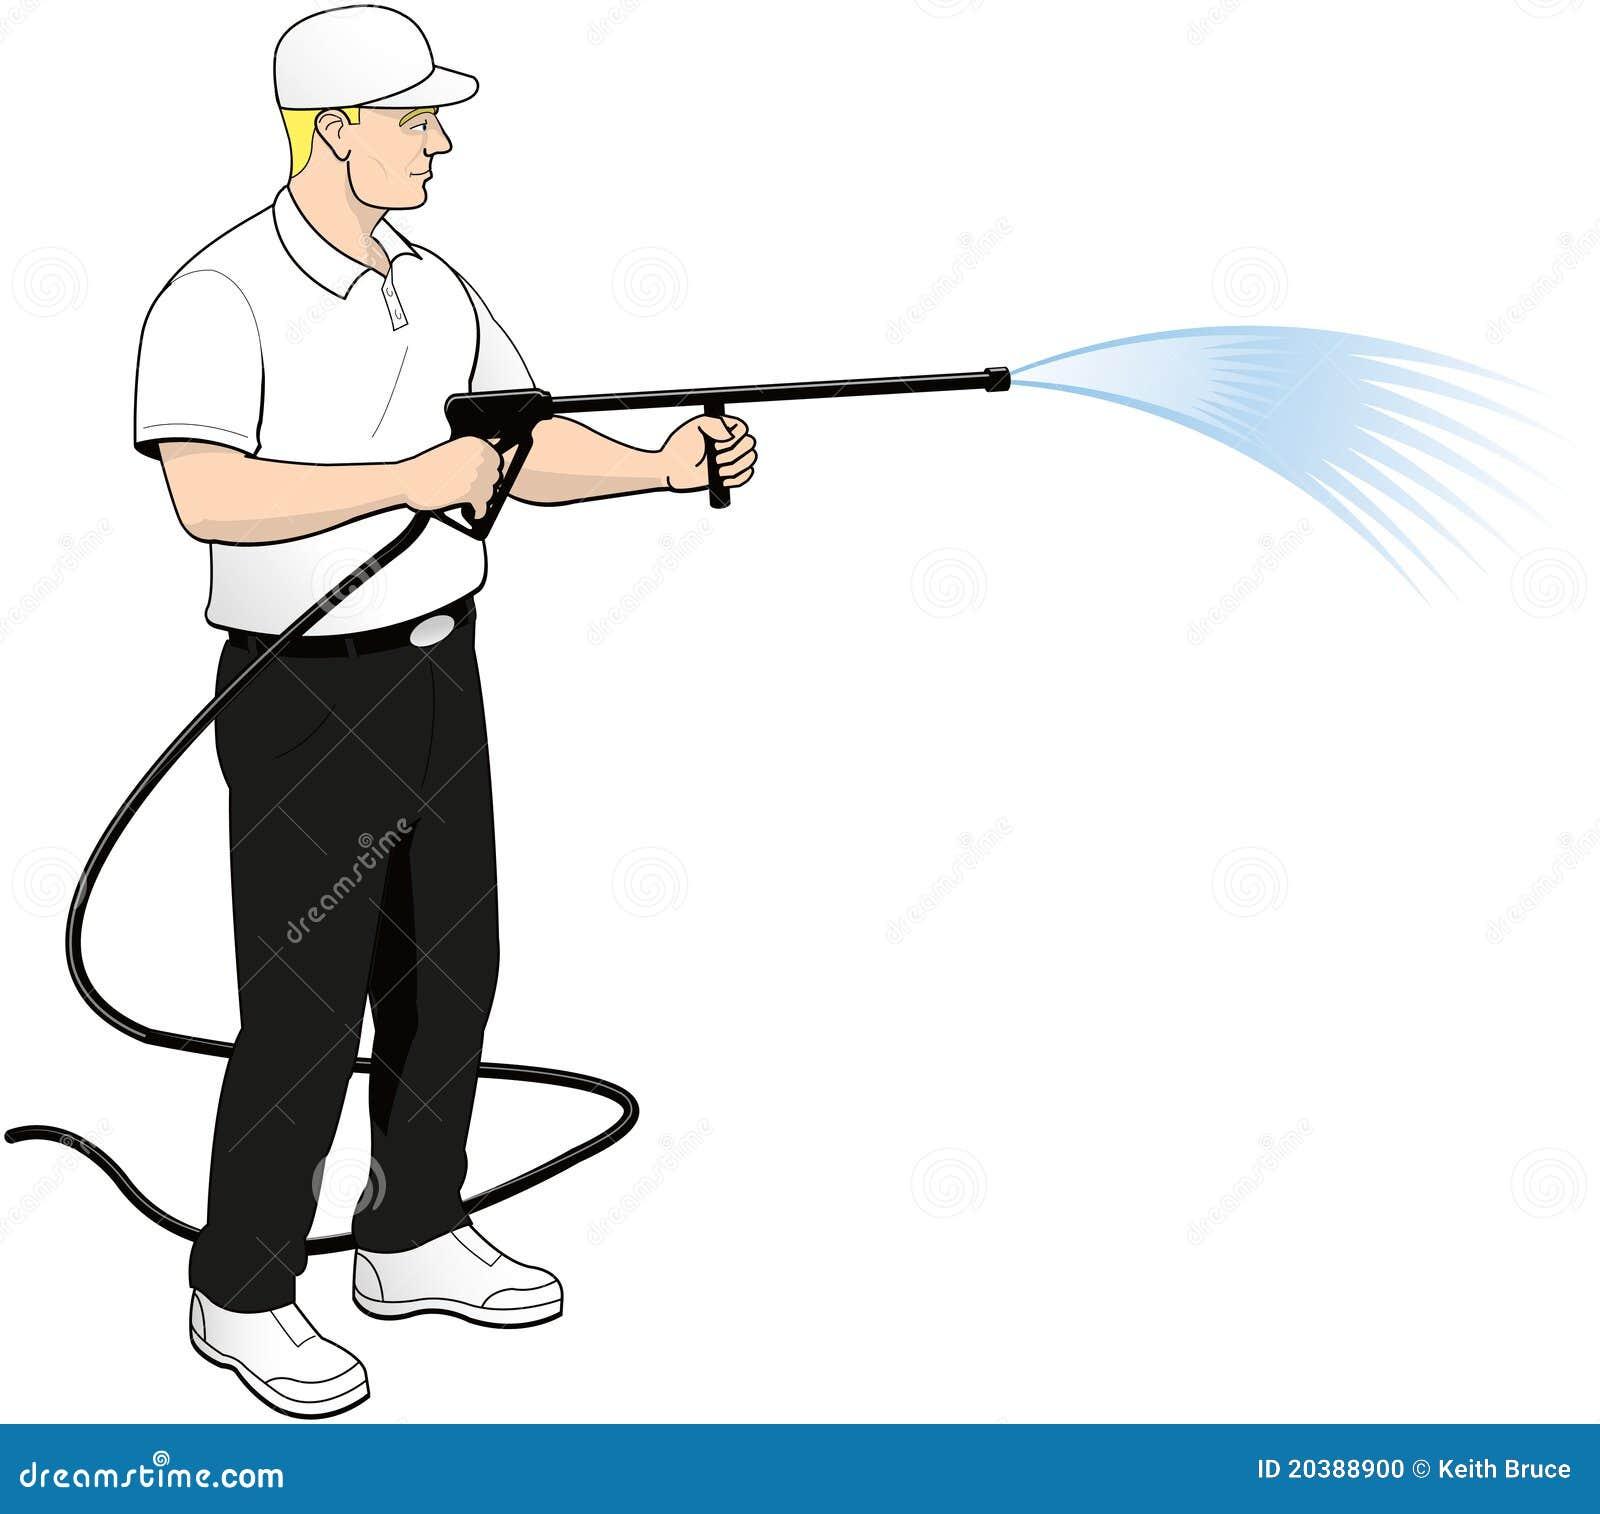 Pressure Power Soft Washing Clip Art Stock Photo Image